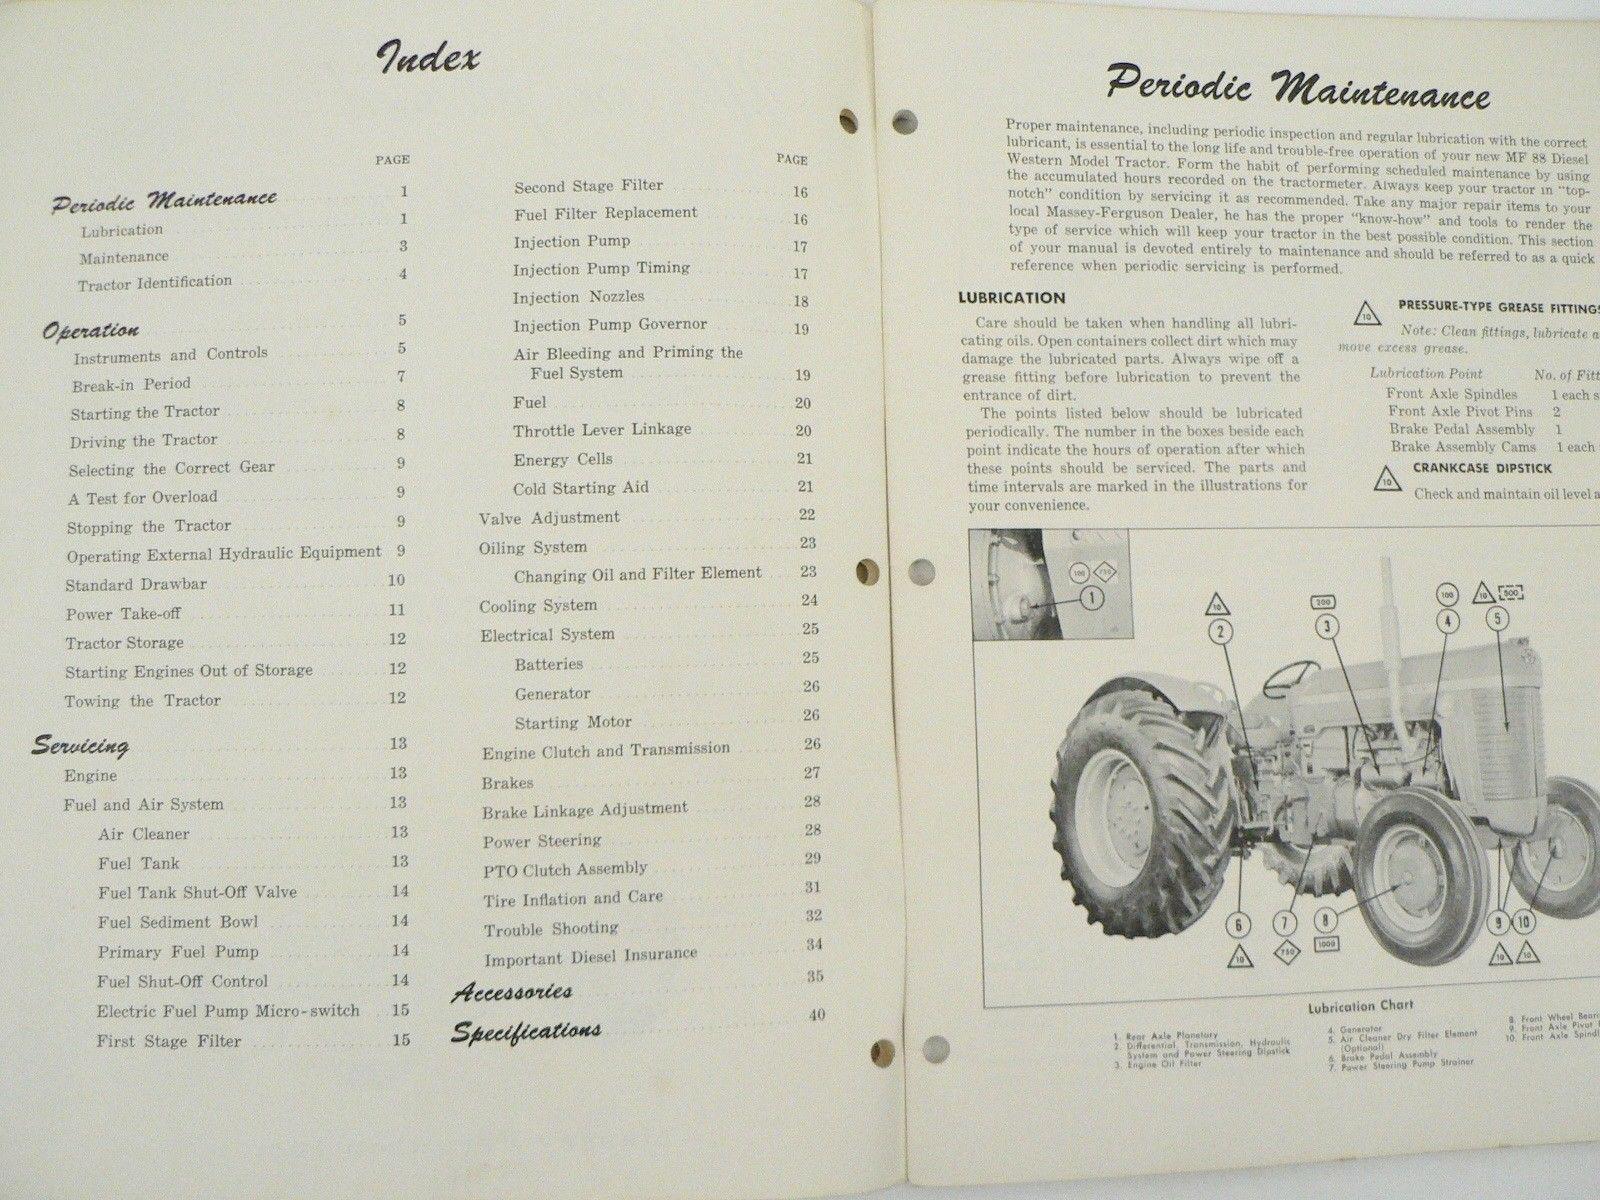 ... VTG Massey Ferguson MF 88 Tractor Owners Manual Maintenance Trouble  Shoot 1960